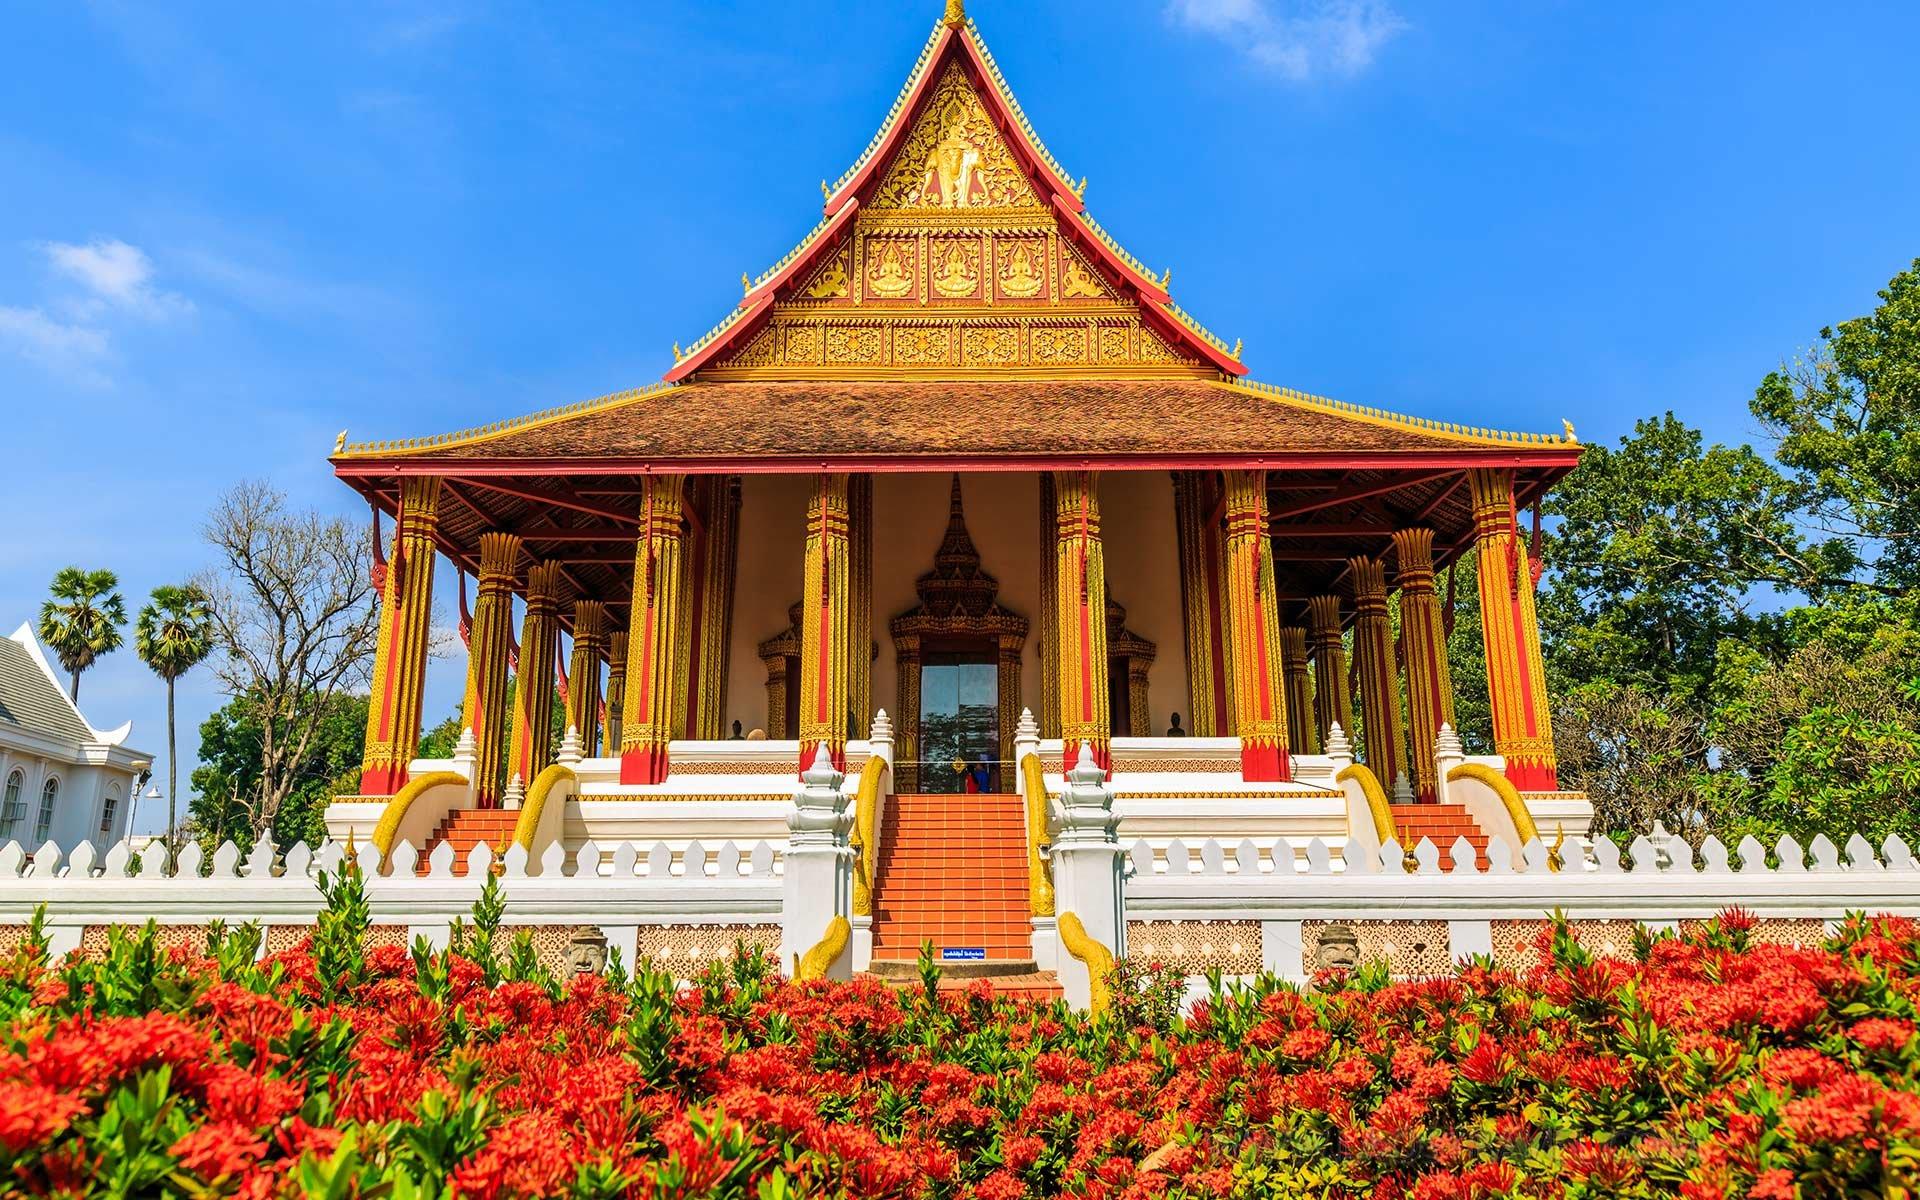 Heritage Luxury Journey (Laos & Vietnam) - 8 days